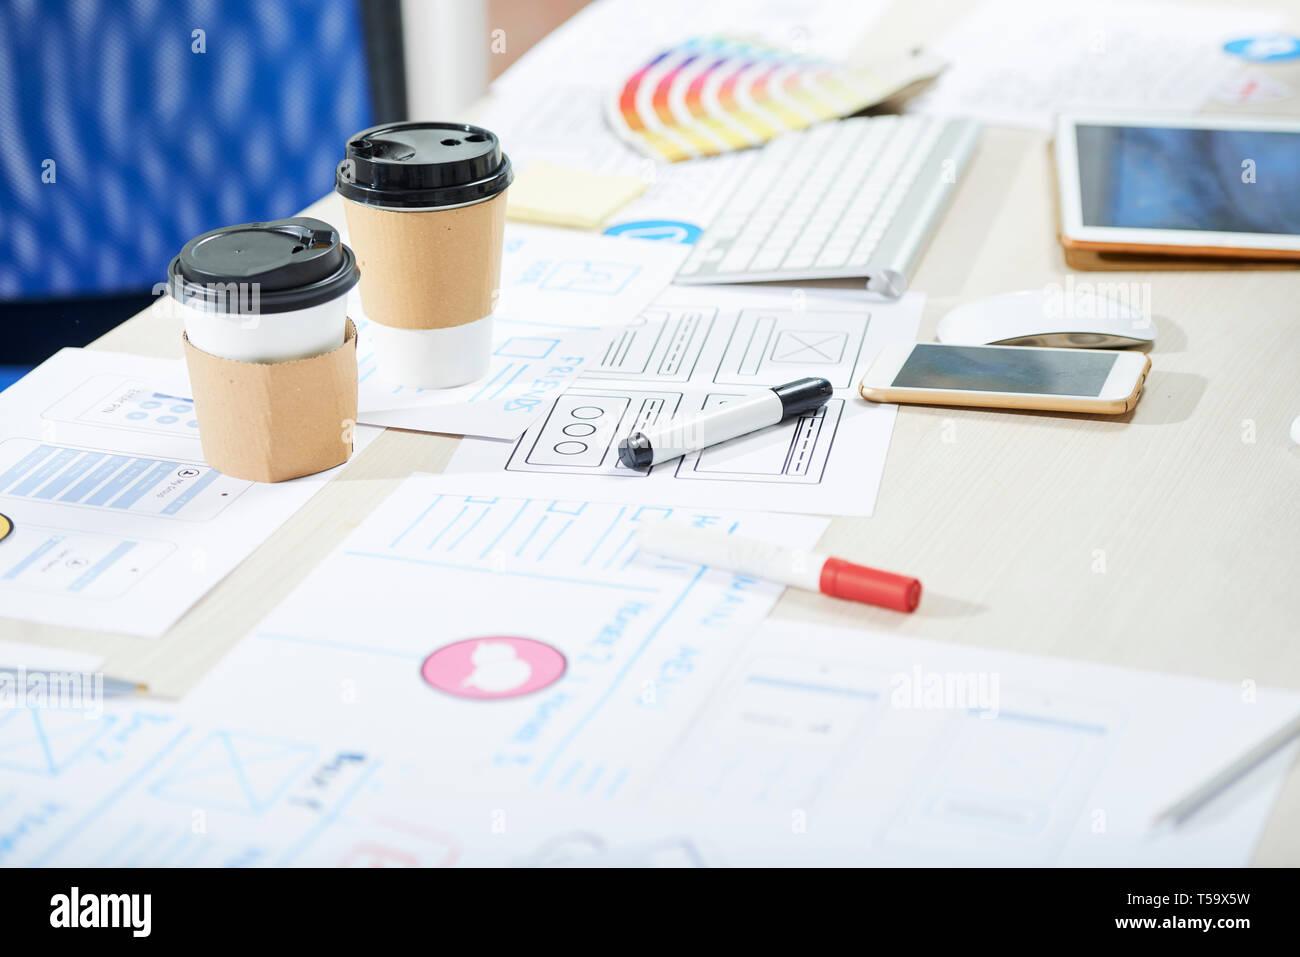 Mess on desk of ux designer - Stock Image